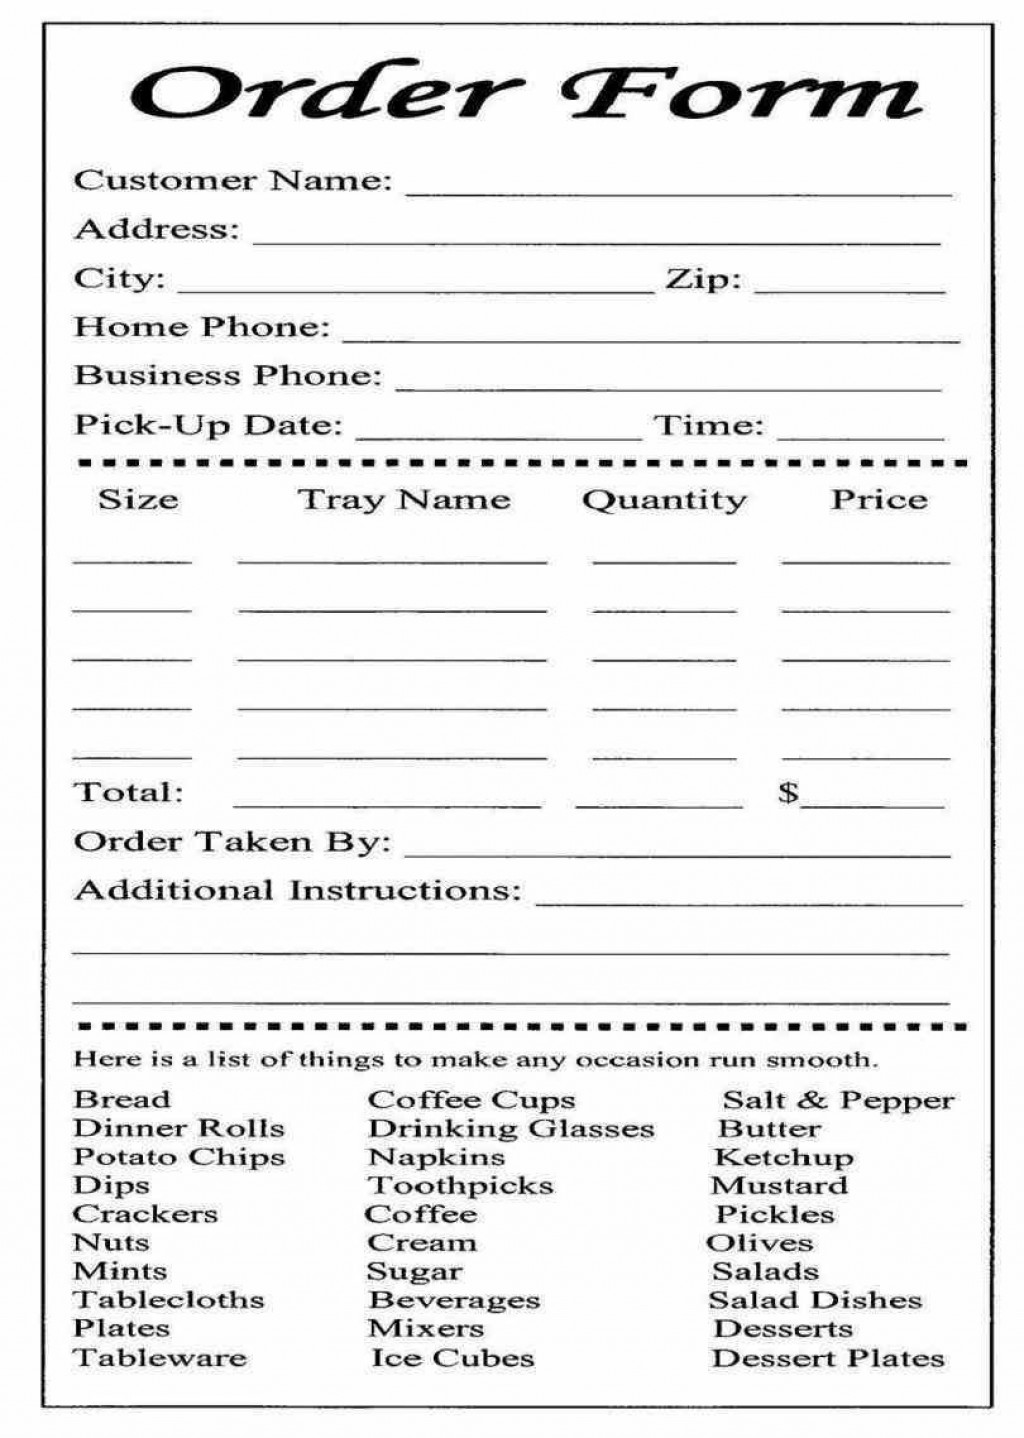 004 Wonderful Food Order Form Template Word Design Large